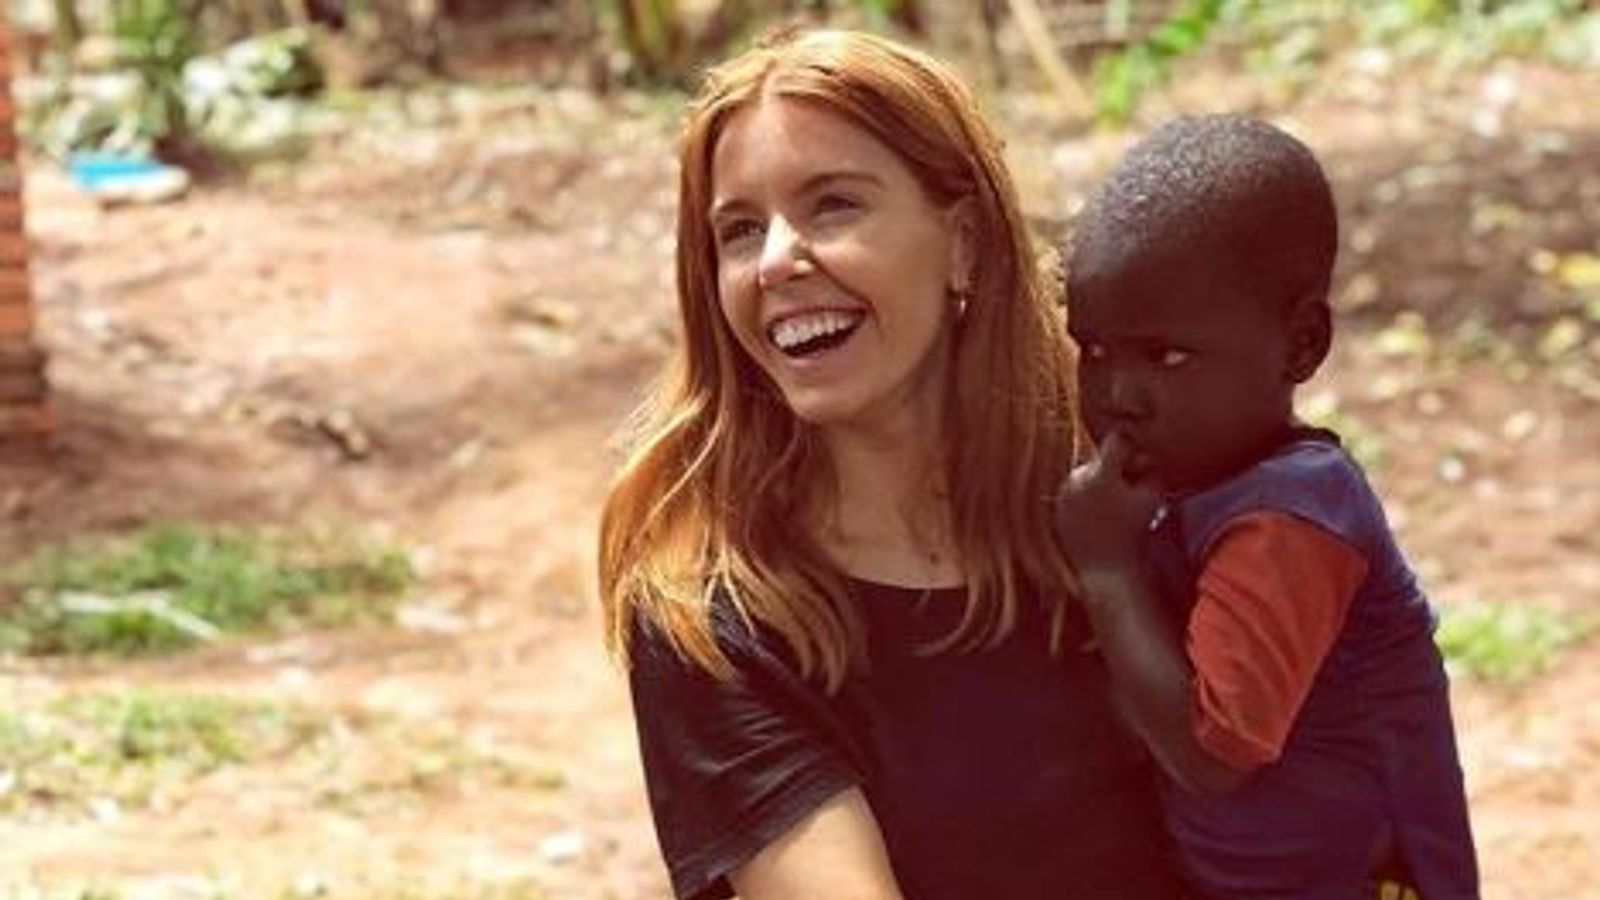 Stacey Dooley Comic Relief Documentary Pics Spark White Saviour Row Uk News Sky News